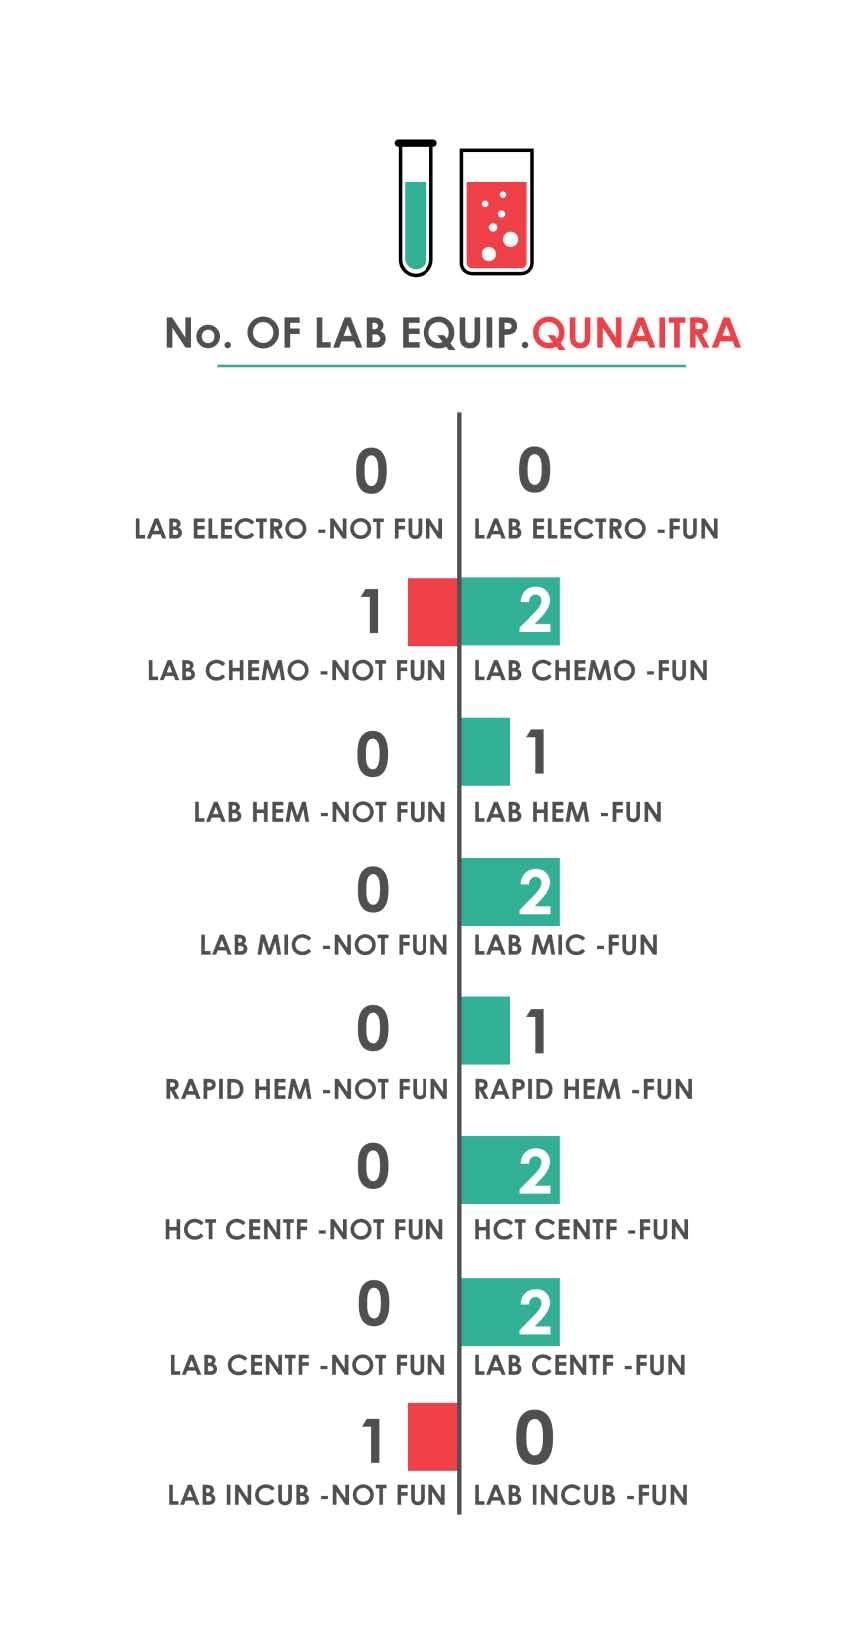 Fig._217.14_Number_of_Laboratory_Equipment__Qunaitra.jpg